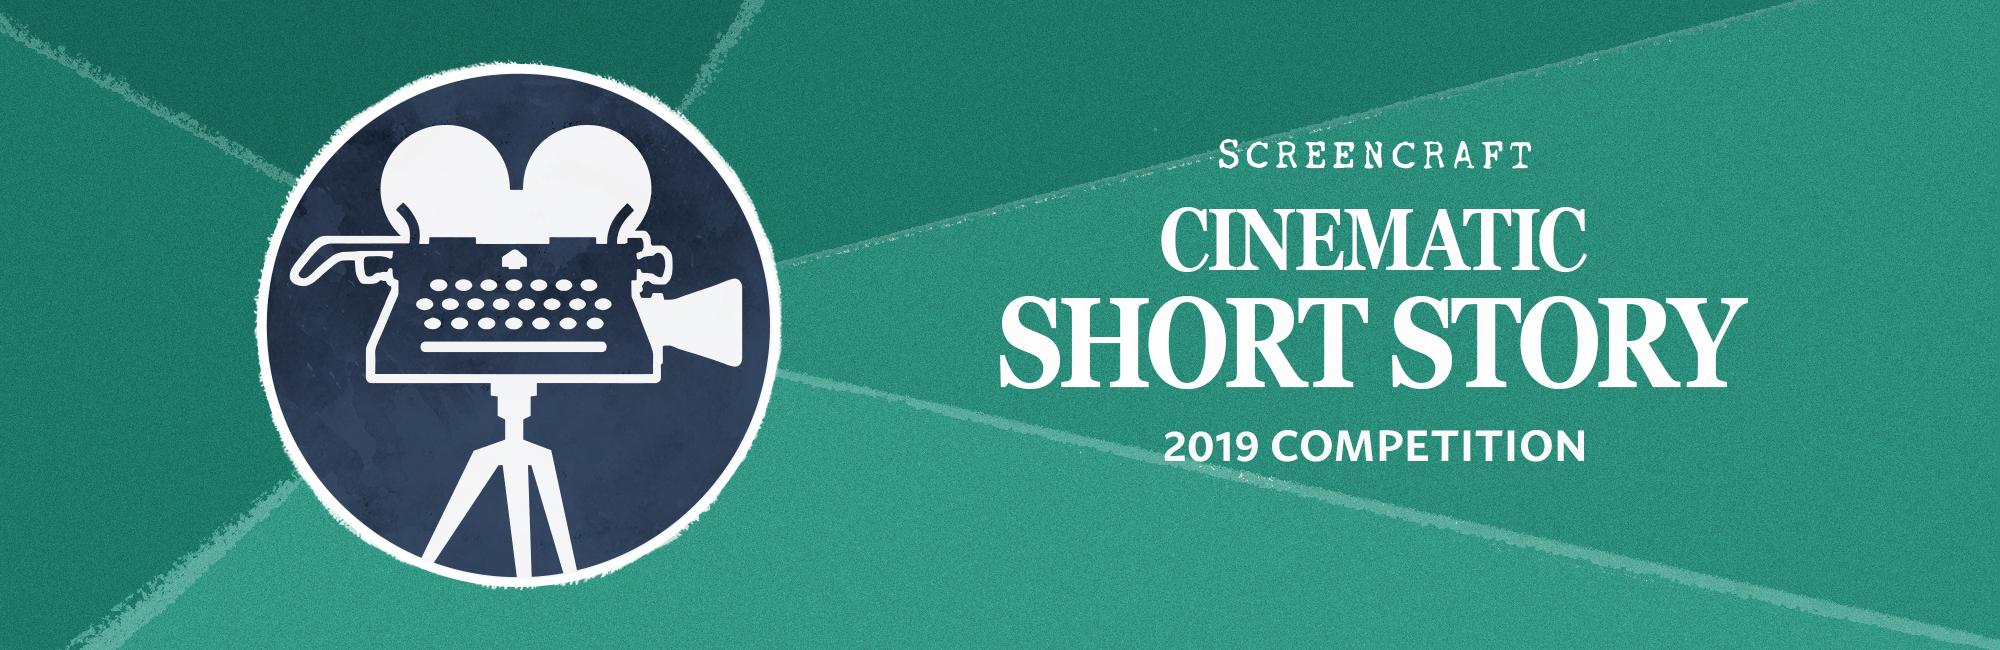 2019-ScreenCraft-ShortStory-2000x650